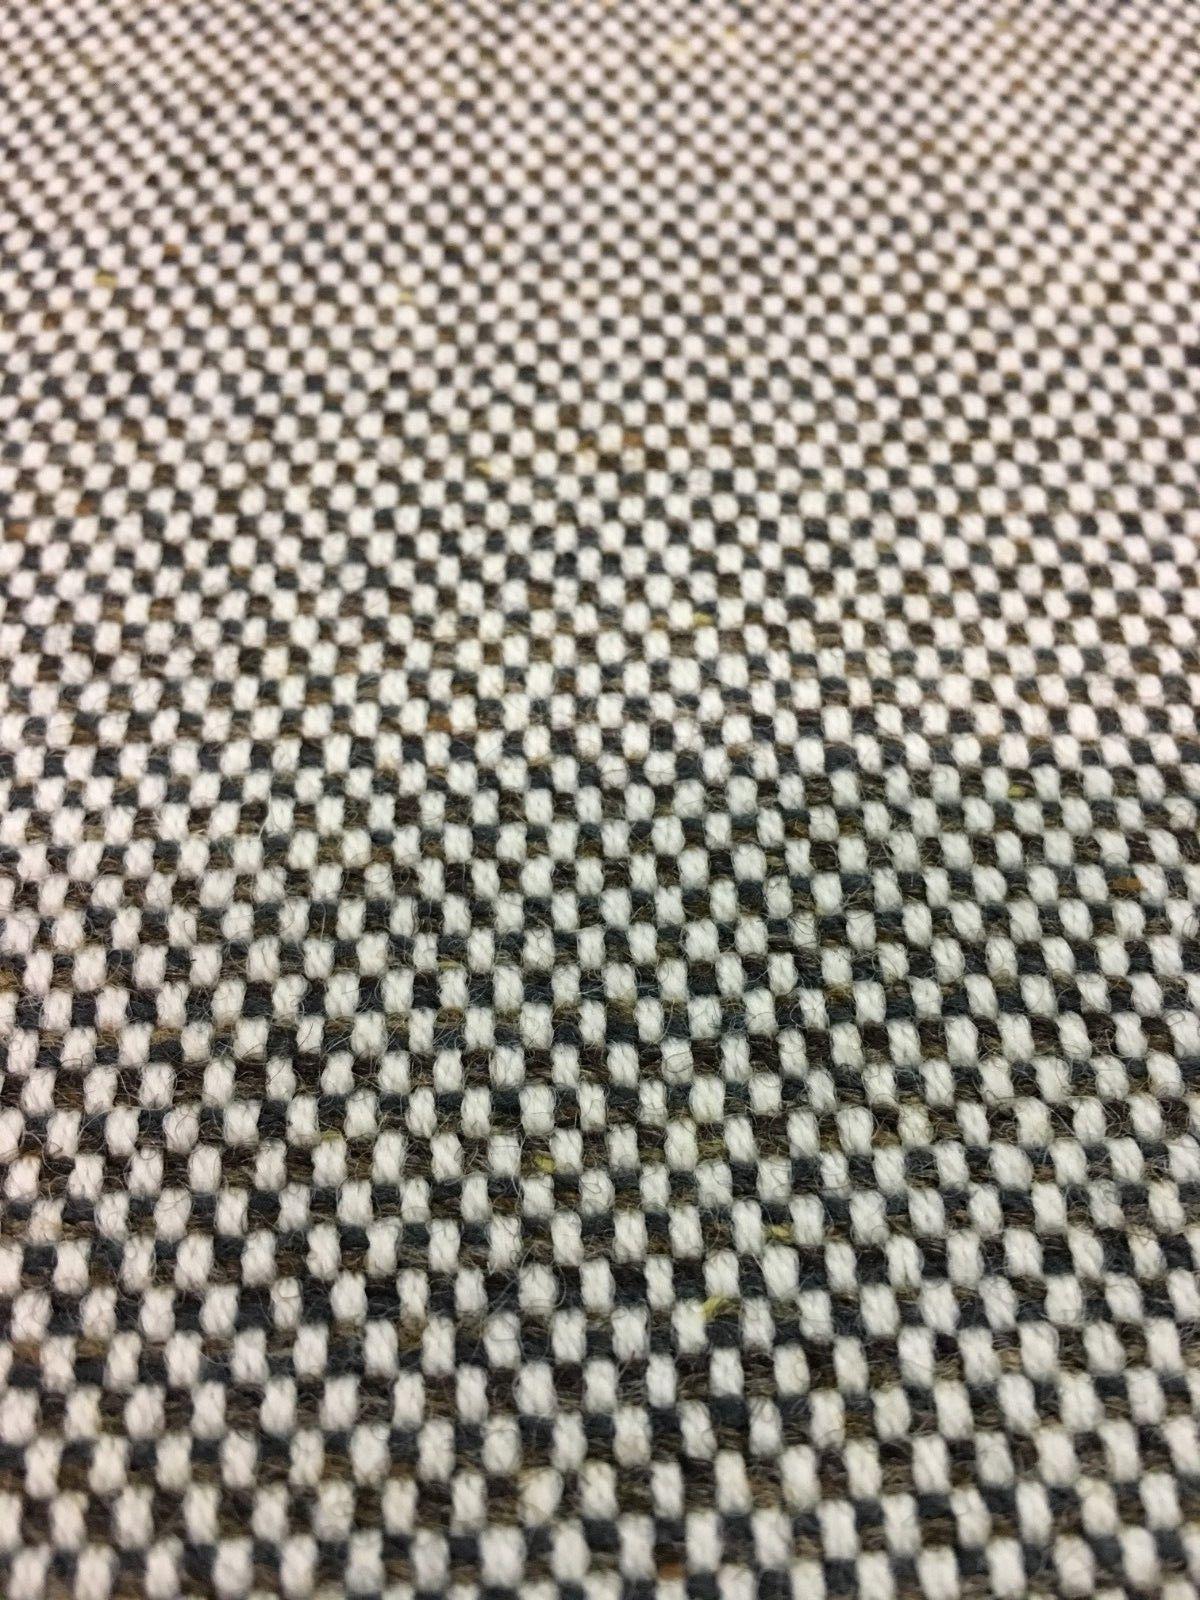 Geiger Upholstery Fabric Mid Century Wool Tweed Gray 1.625 yds - W